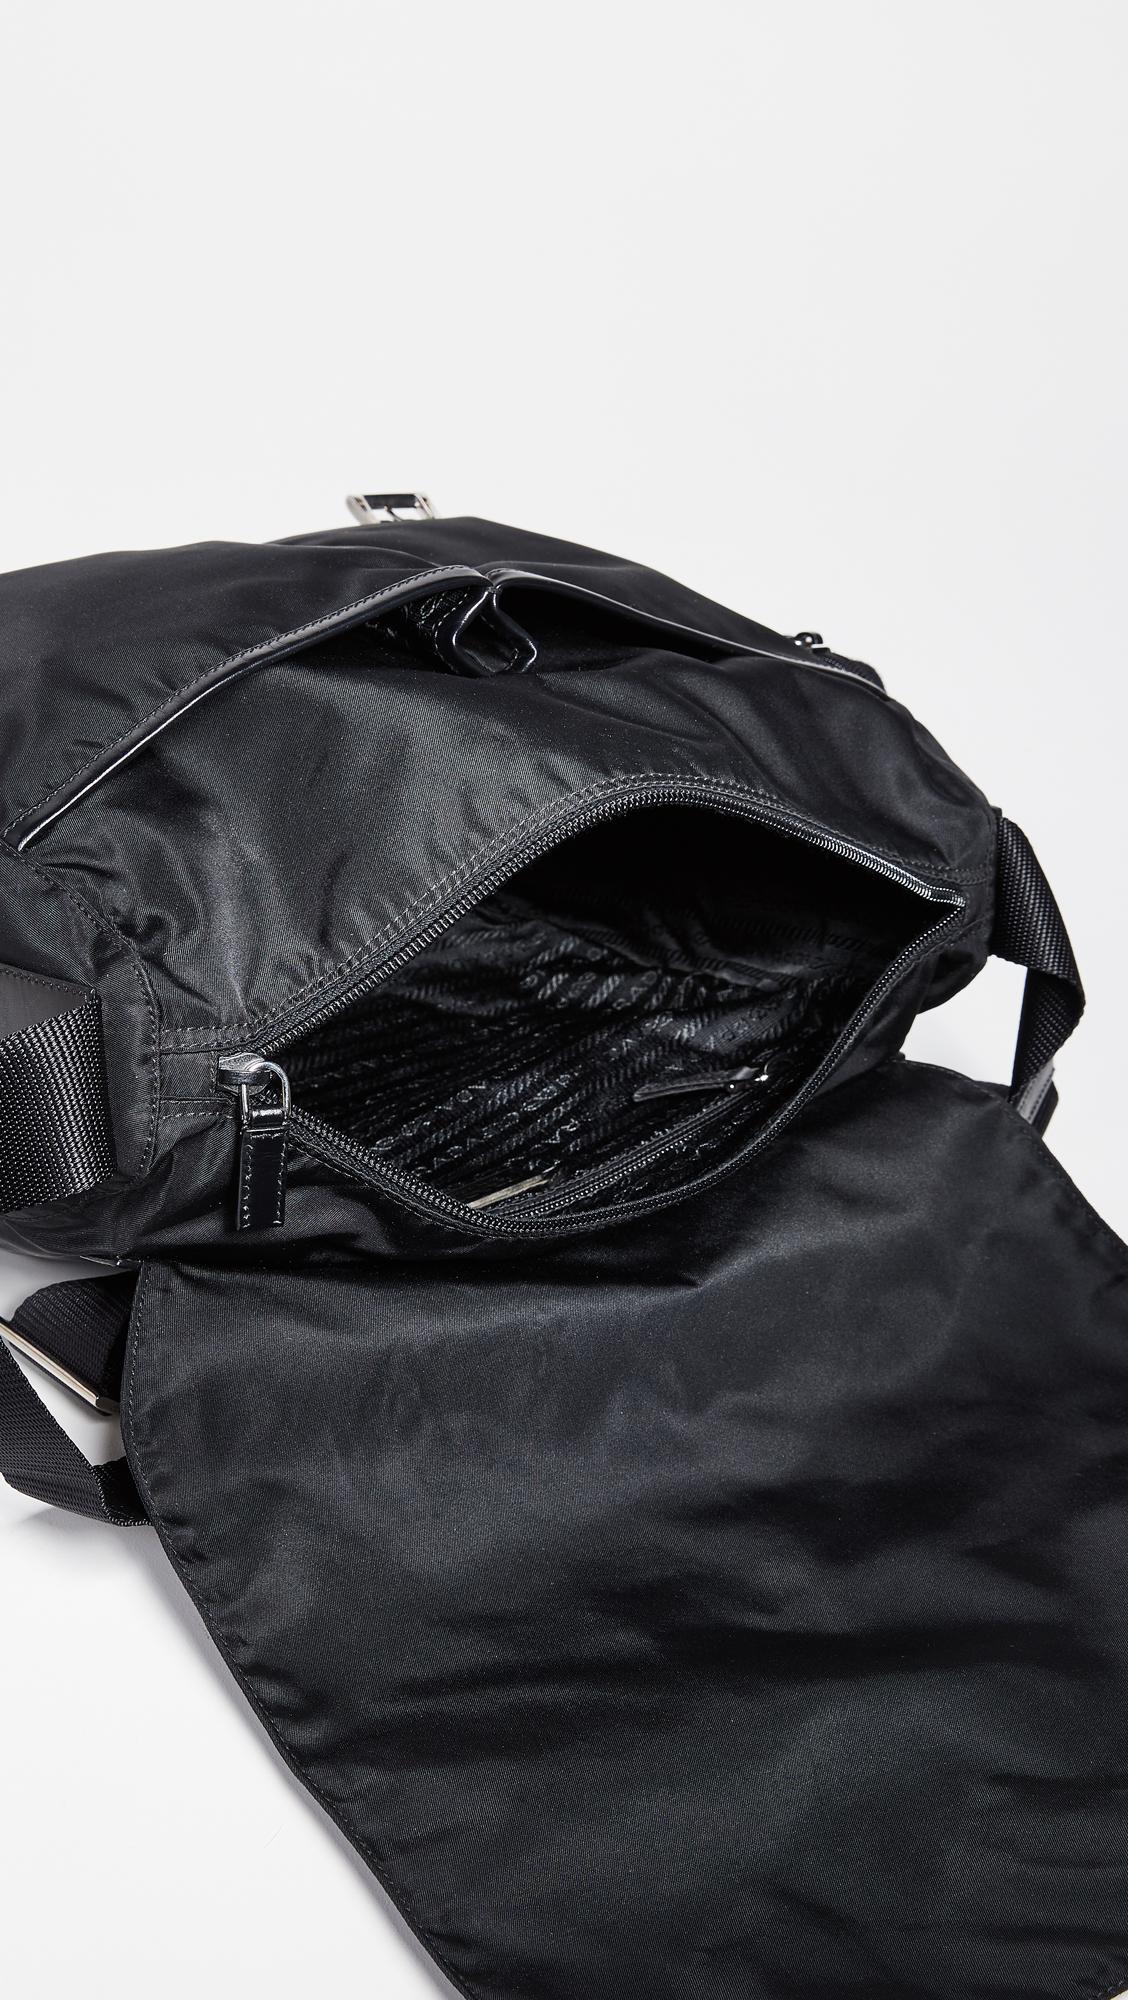 567ad40402a5 What Goes Around Comes Around Prada Nylon Messenger Bag